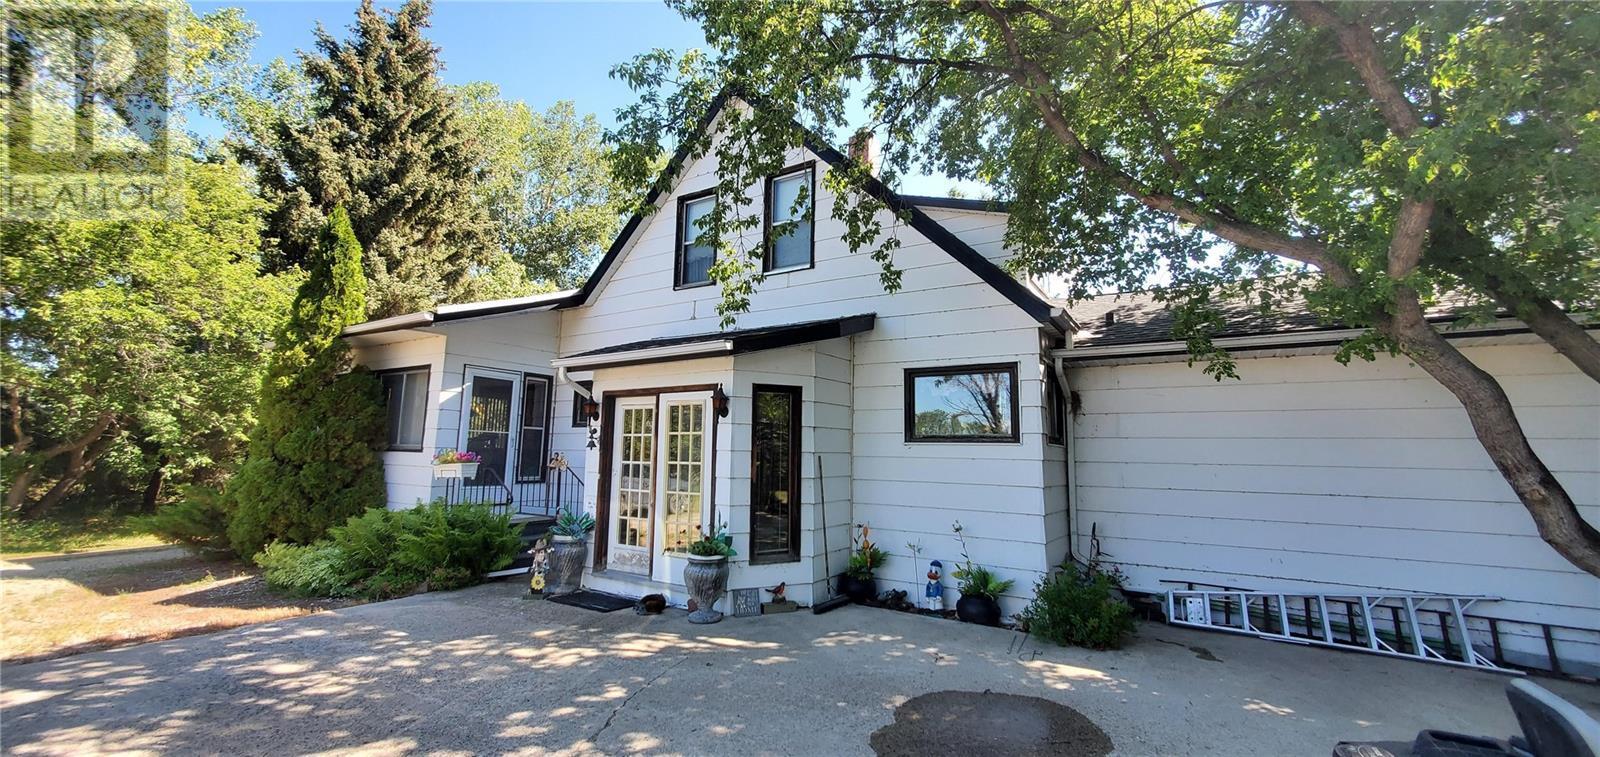 31.1 Acres - Chutskoff Acreage, el capo rm no. 154, Saskatchewan